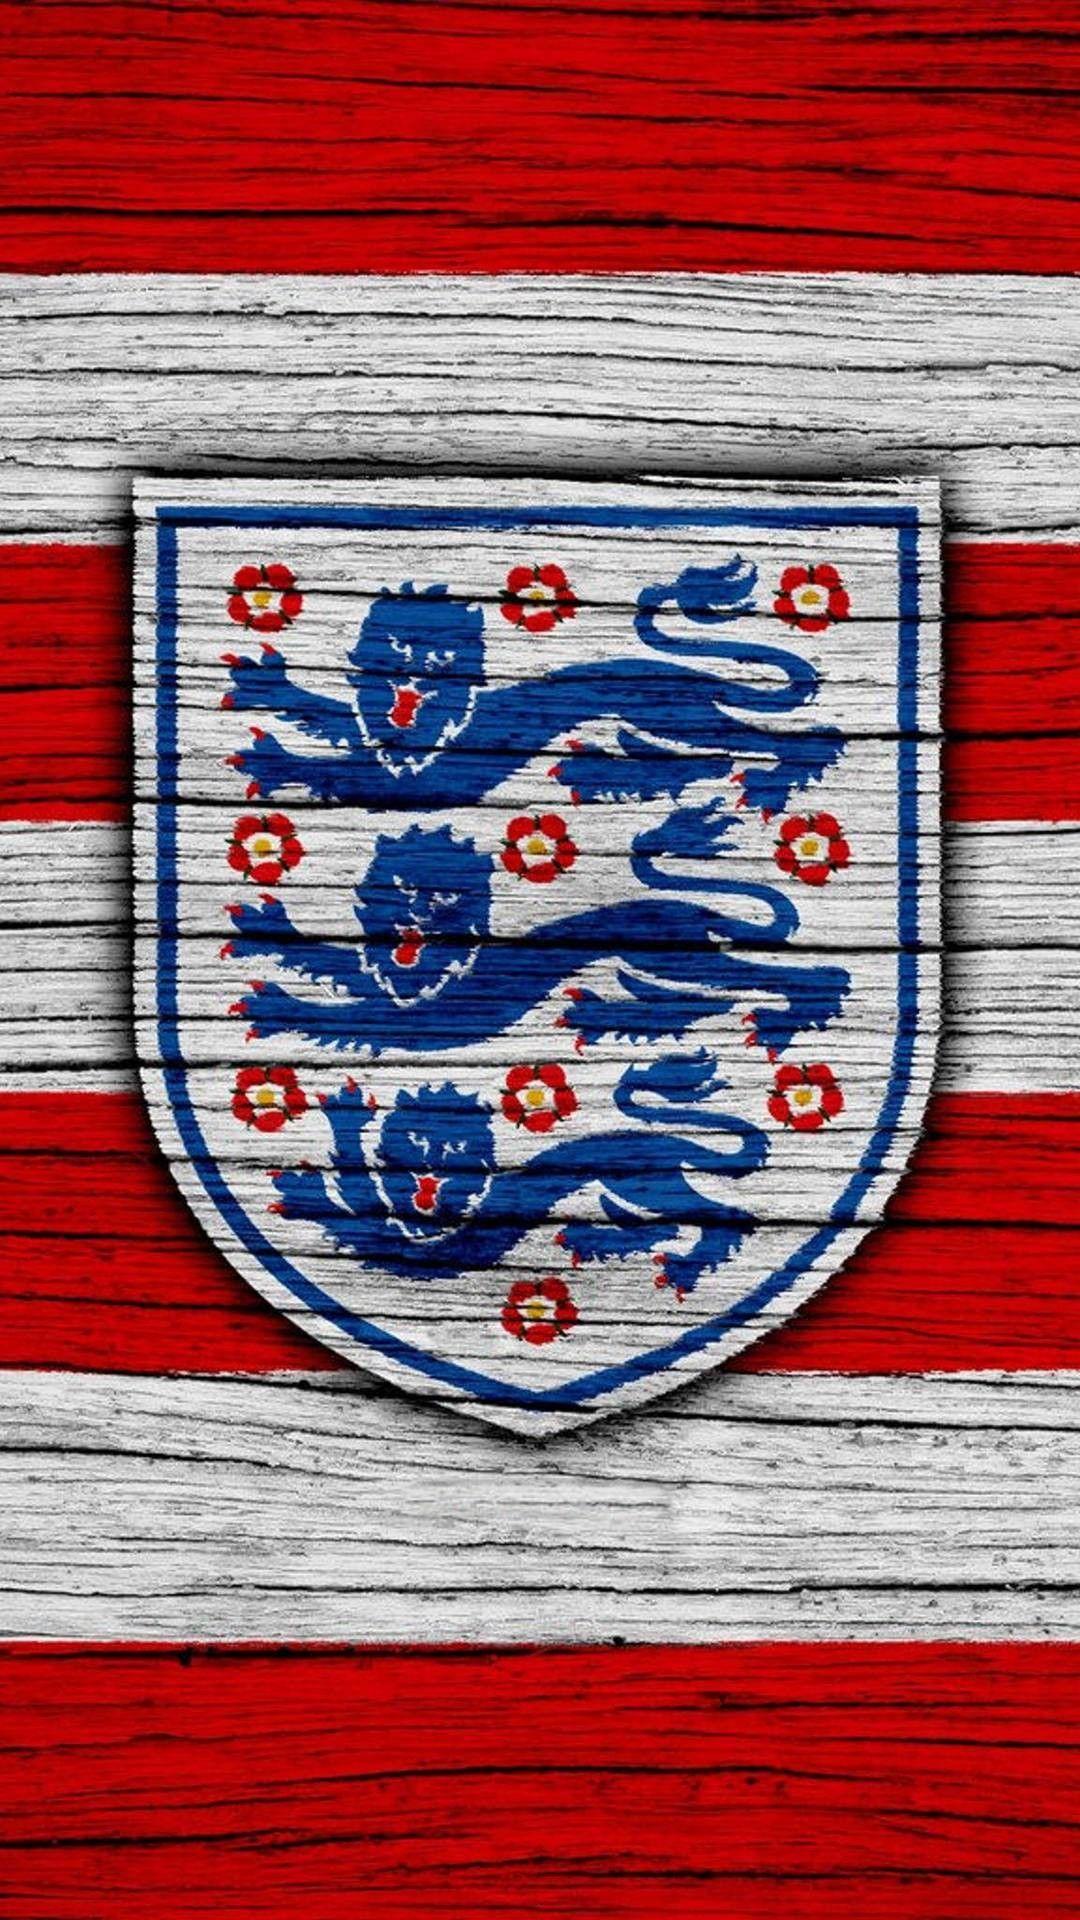 England Pic Wallpaper England National Football Team Team Wallpaper England Football